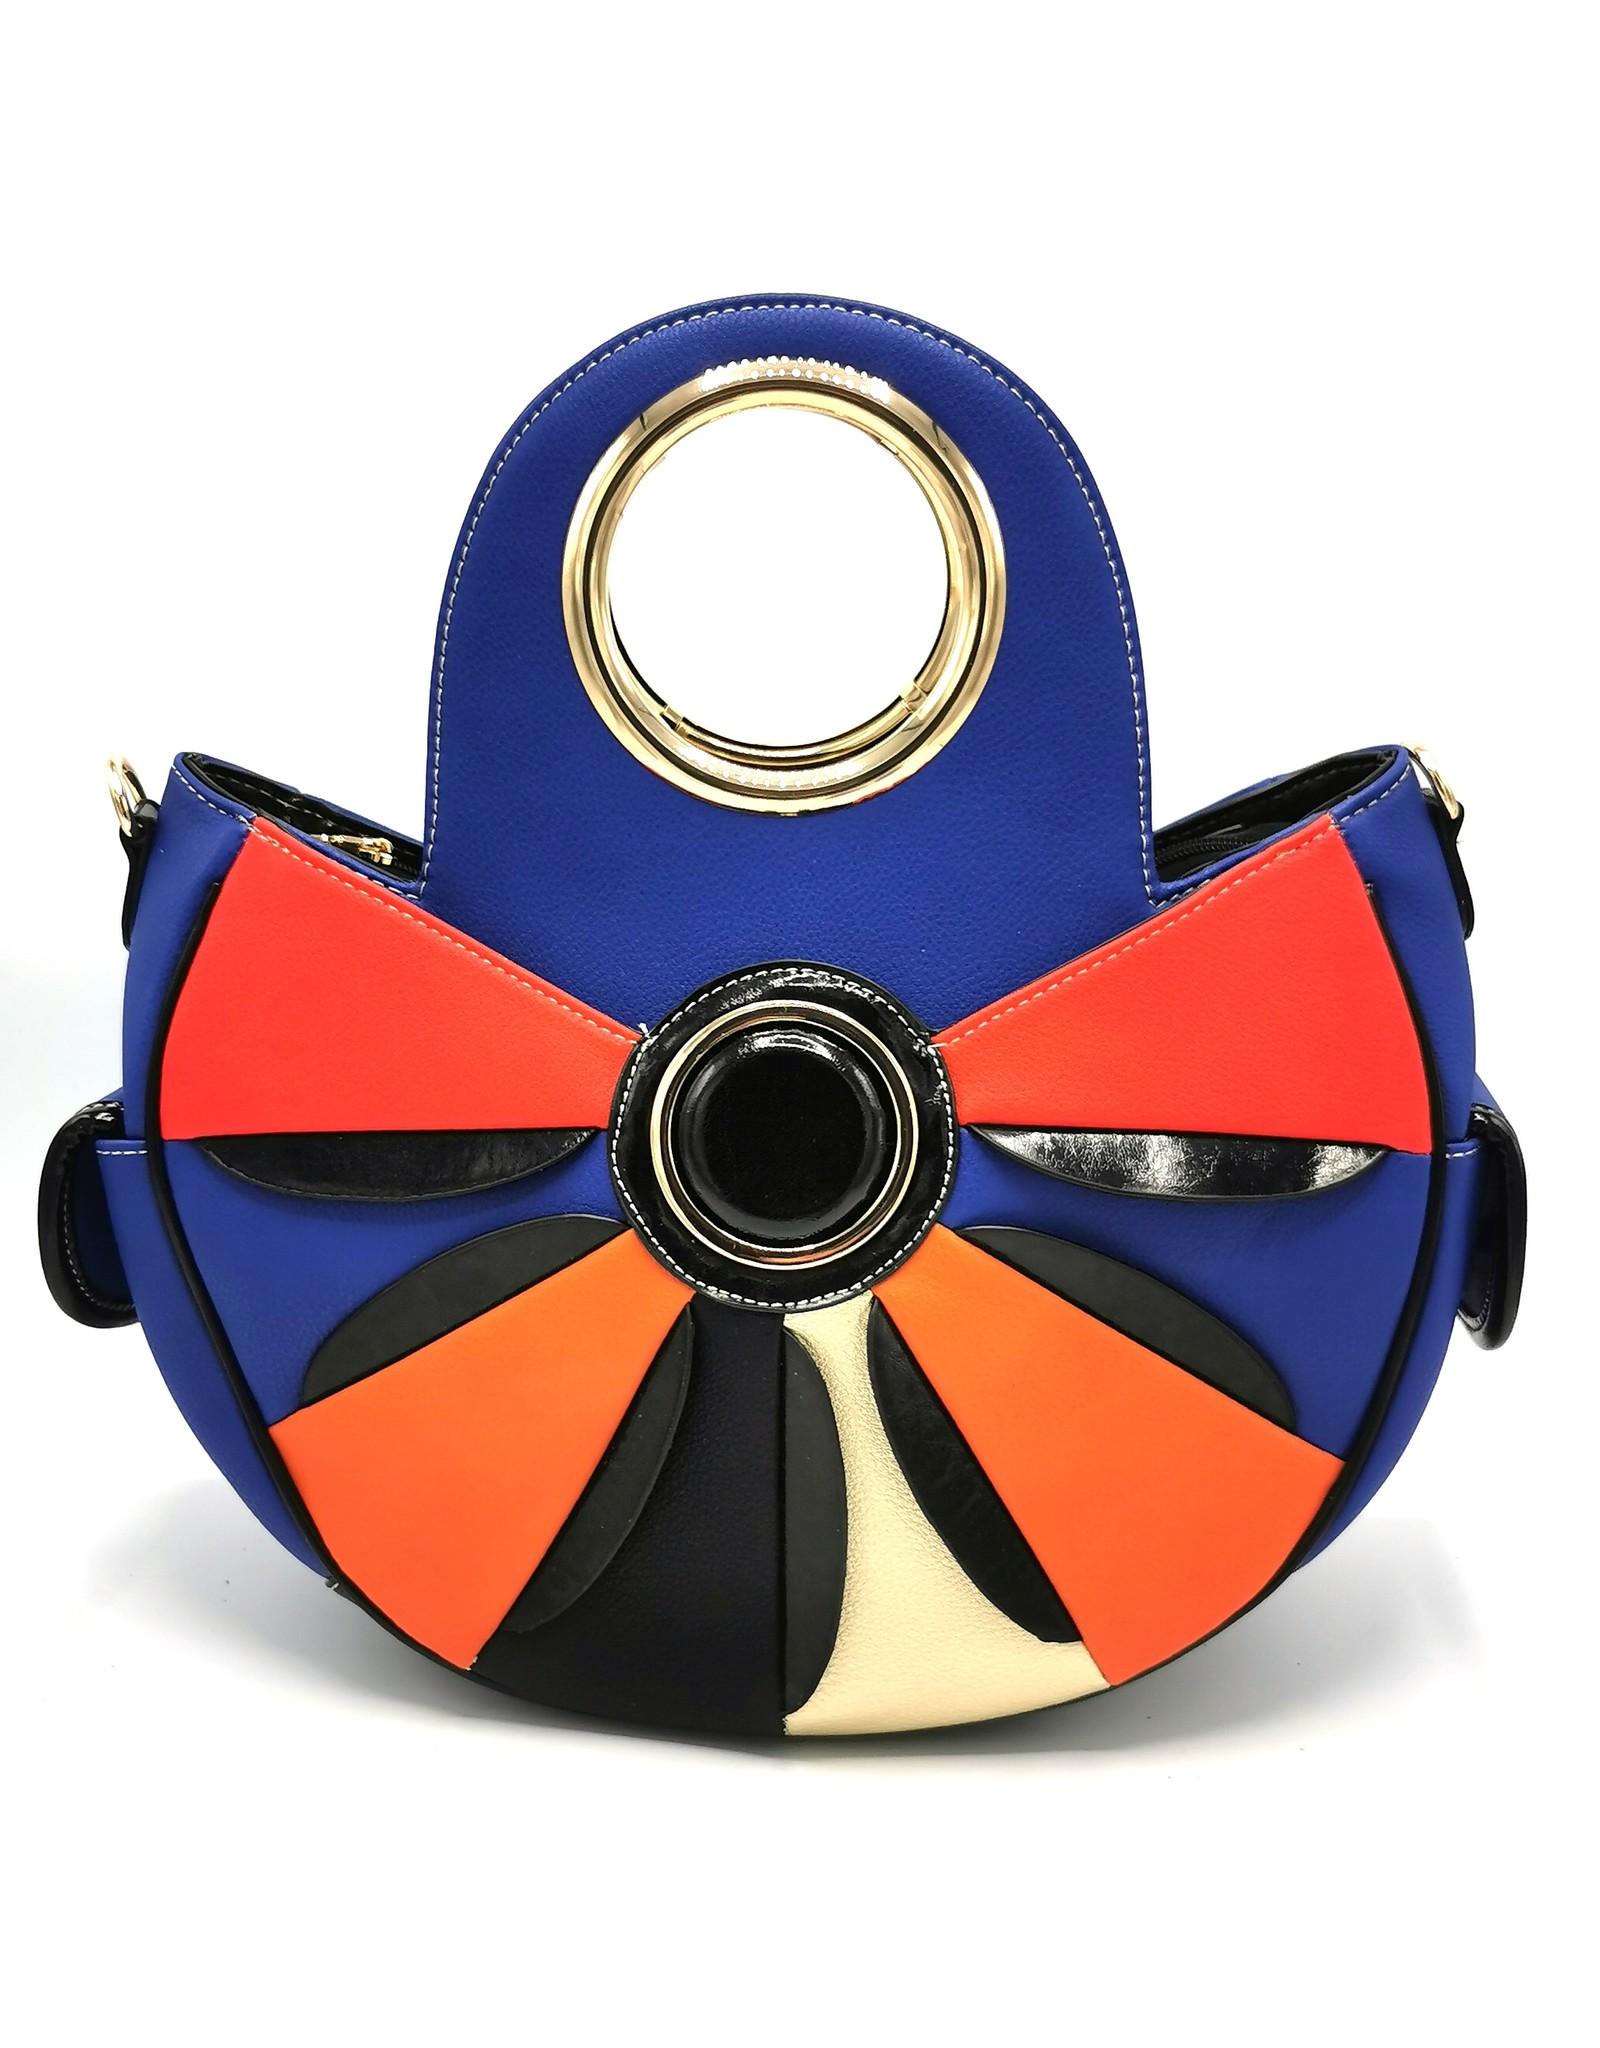 Angelo Fashion bags - Flower Power Handbag Flower blue